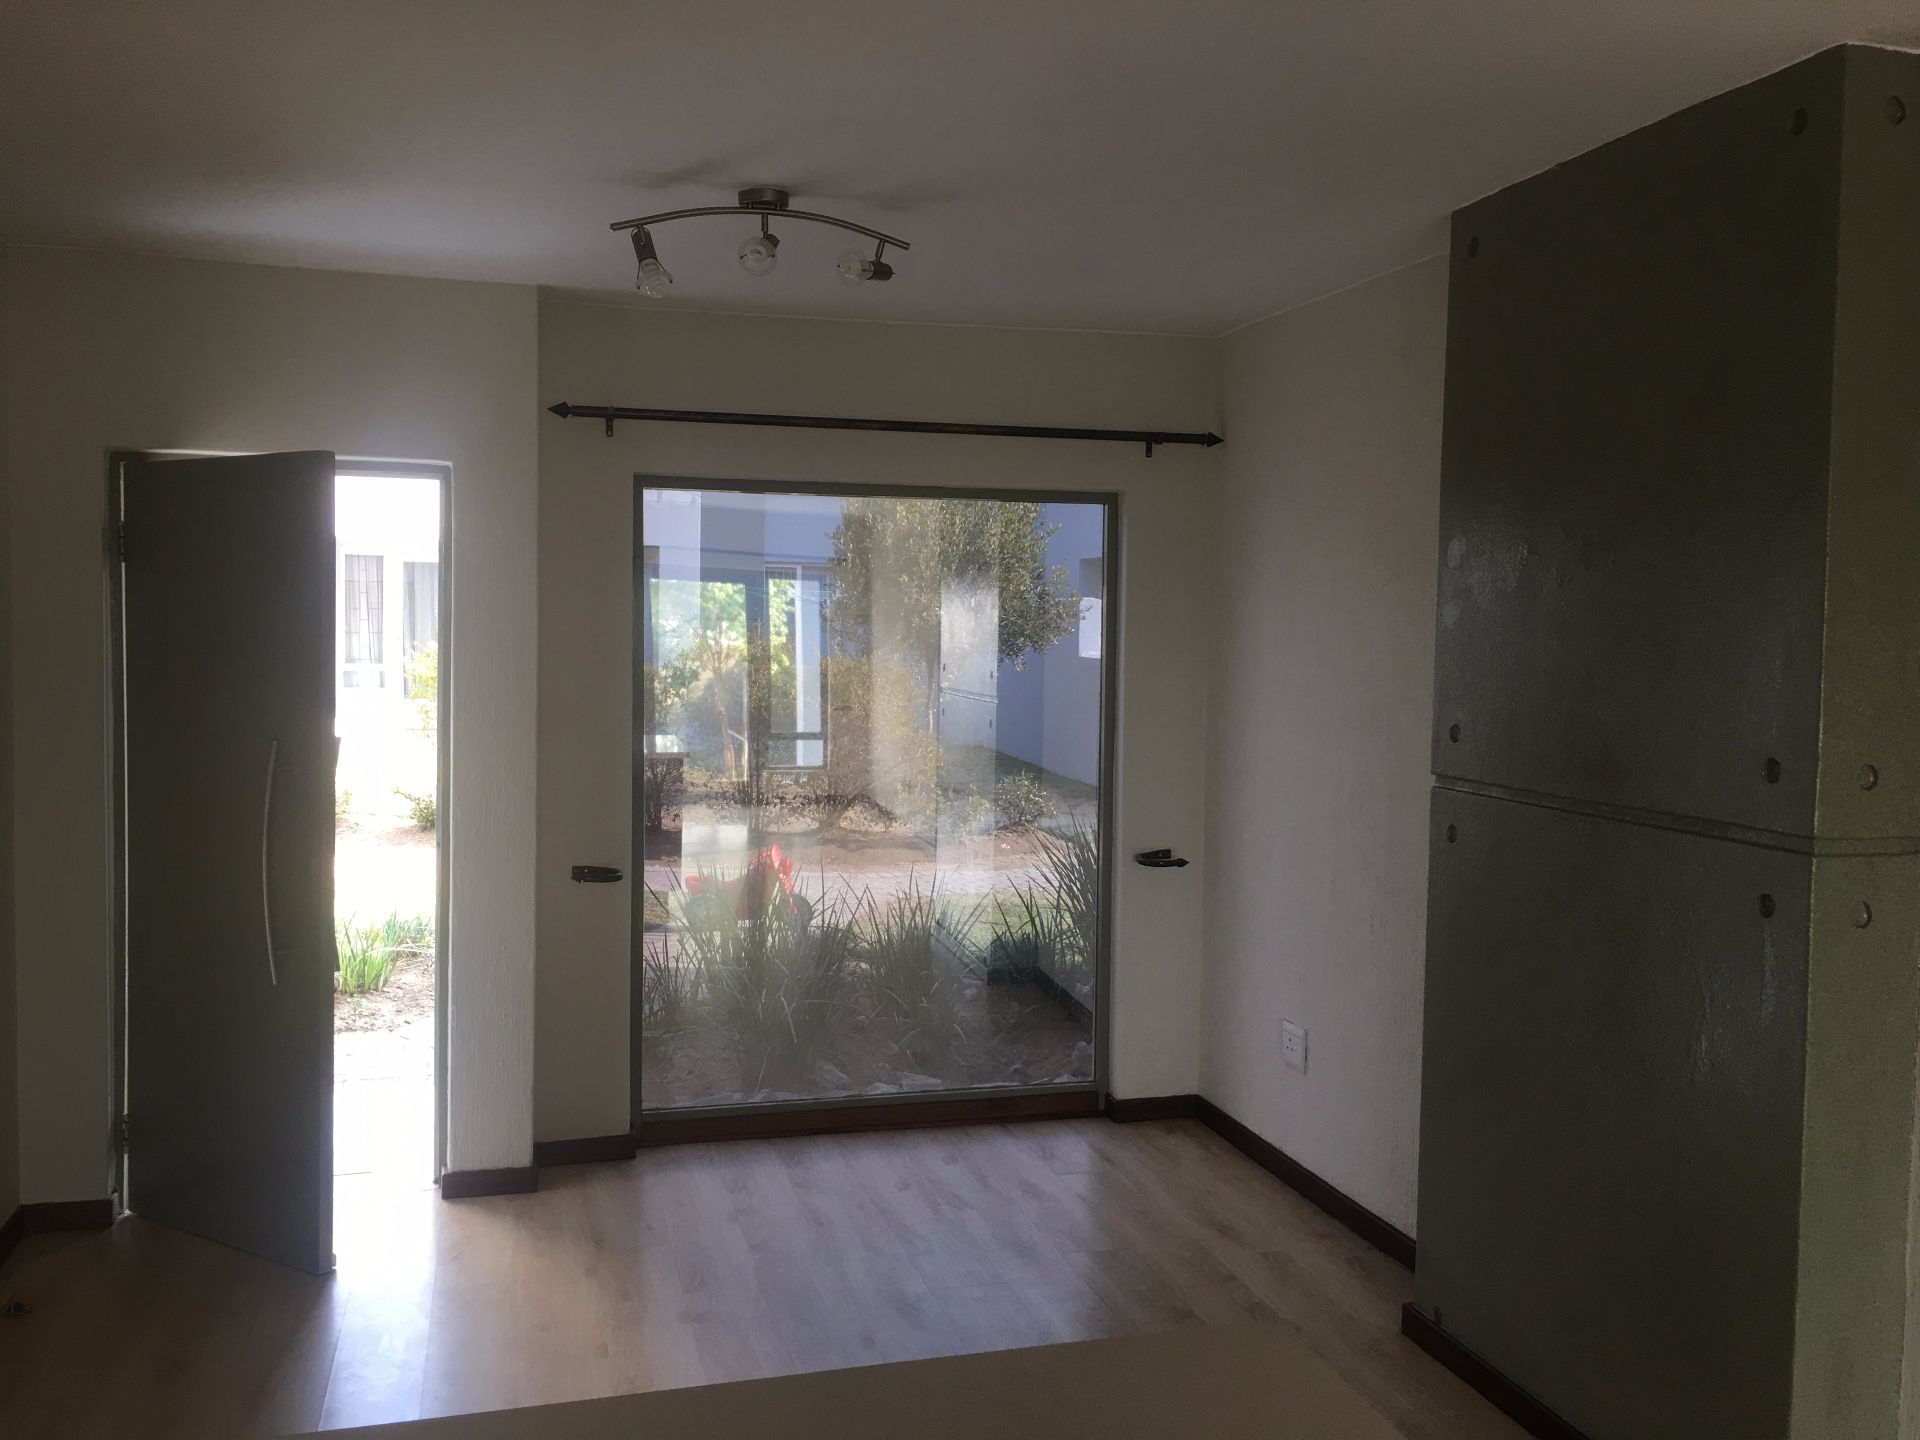 Broadacres property for sale. Ref No: 13529583. Picture no 3